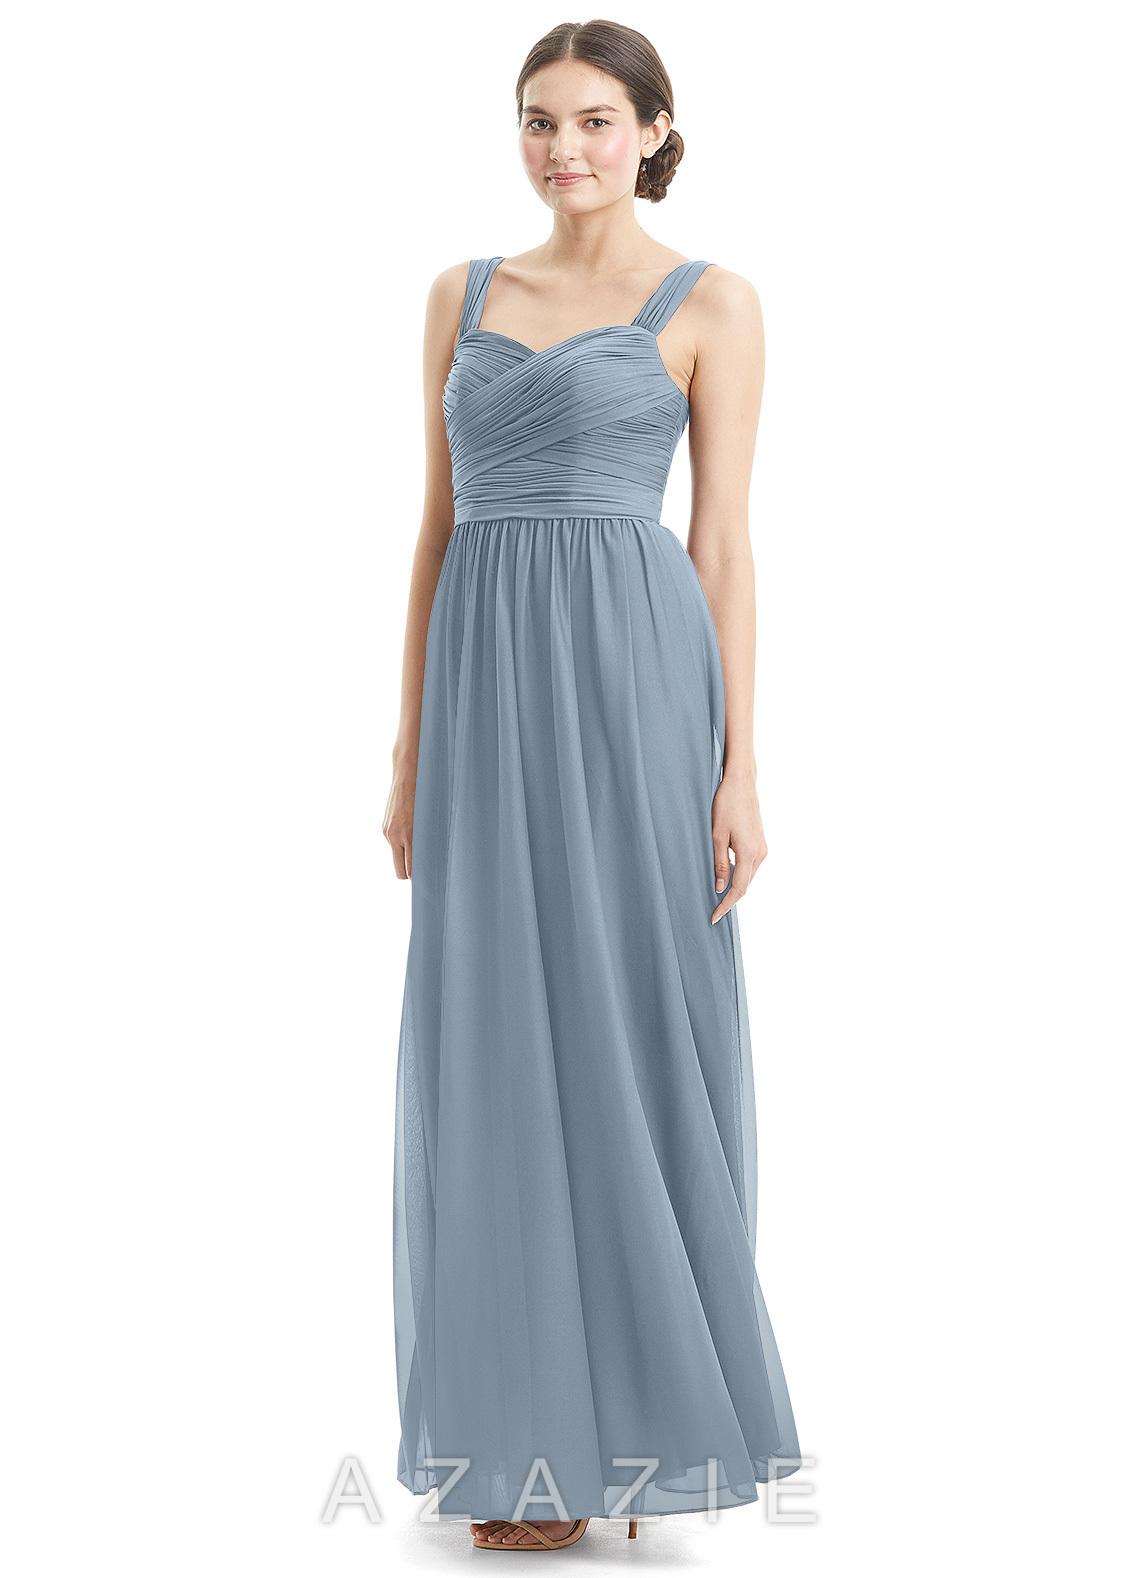 cf7321f458 Azazie Sky Bridesmaid Dress